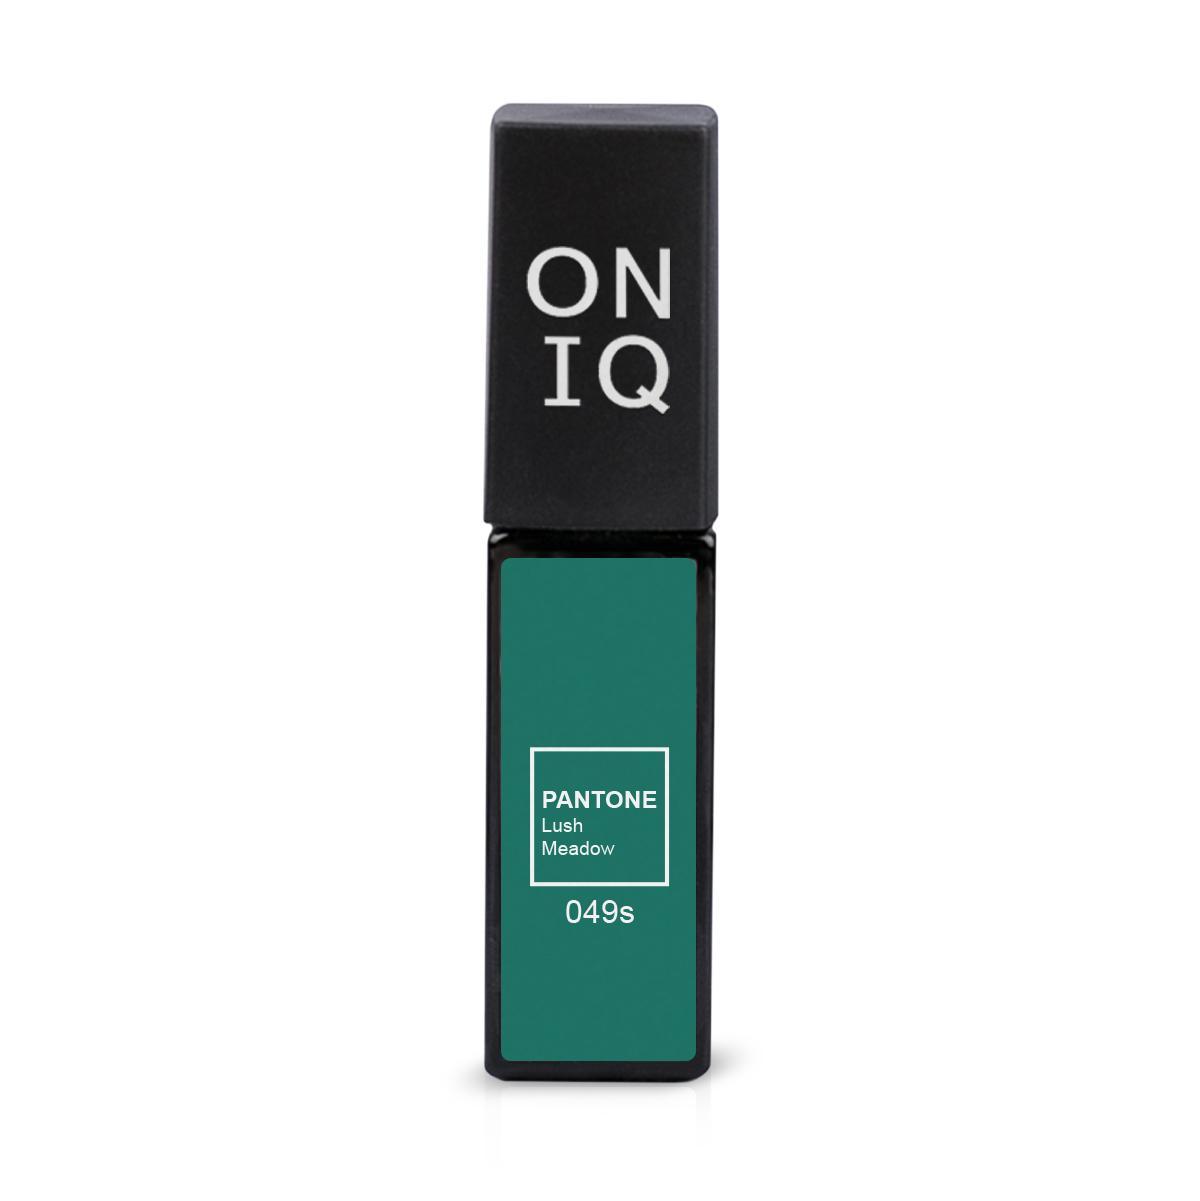 Купить Гель-лак Oniq PANTONE: Lush meadow 6 мл